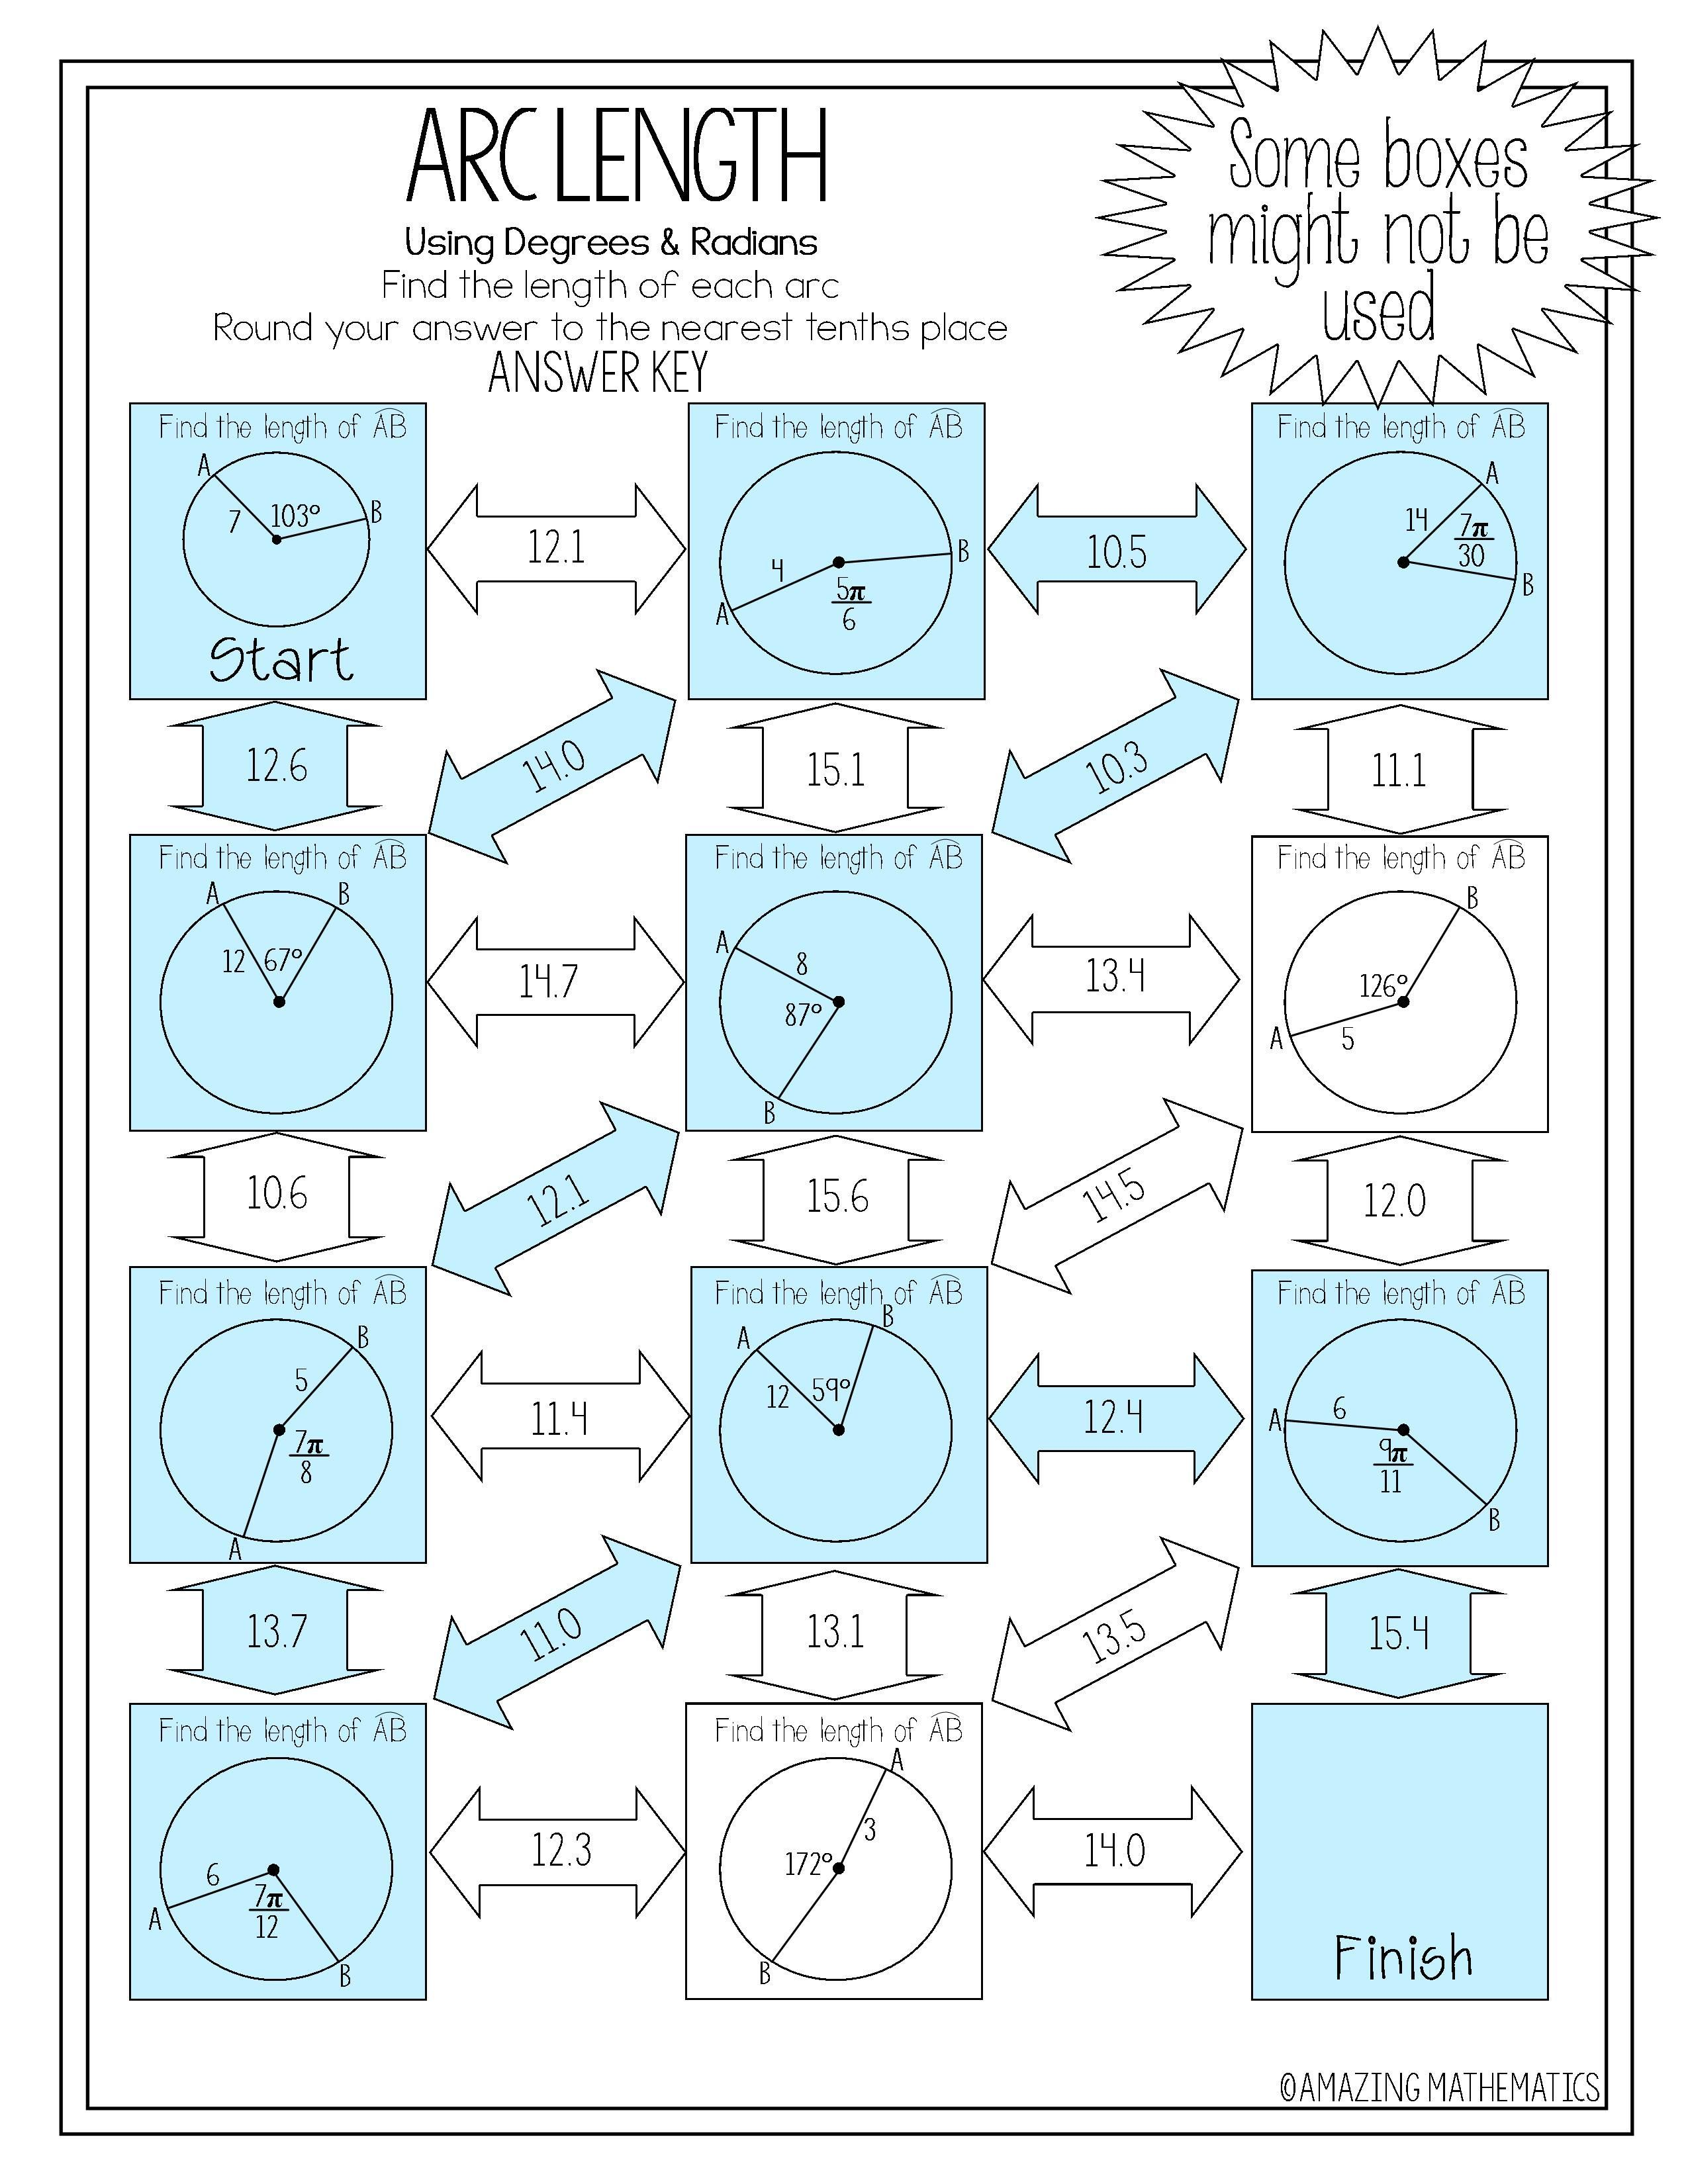 Fc41ce6800a4b13fc1816d275ad3f149 Jpg 2 550 3 300 Pixels Geometry Activities Geometry Worksheets Teaching Geometry